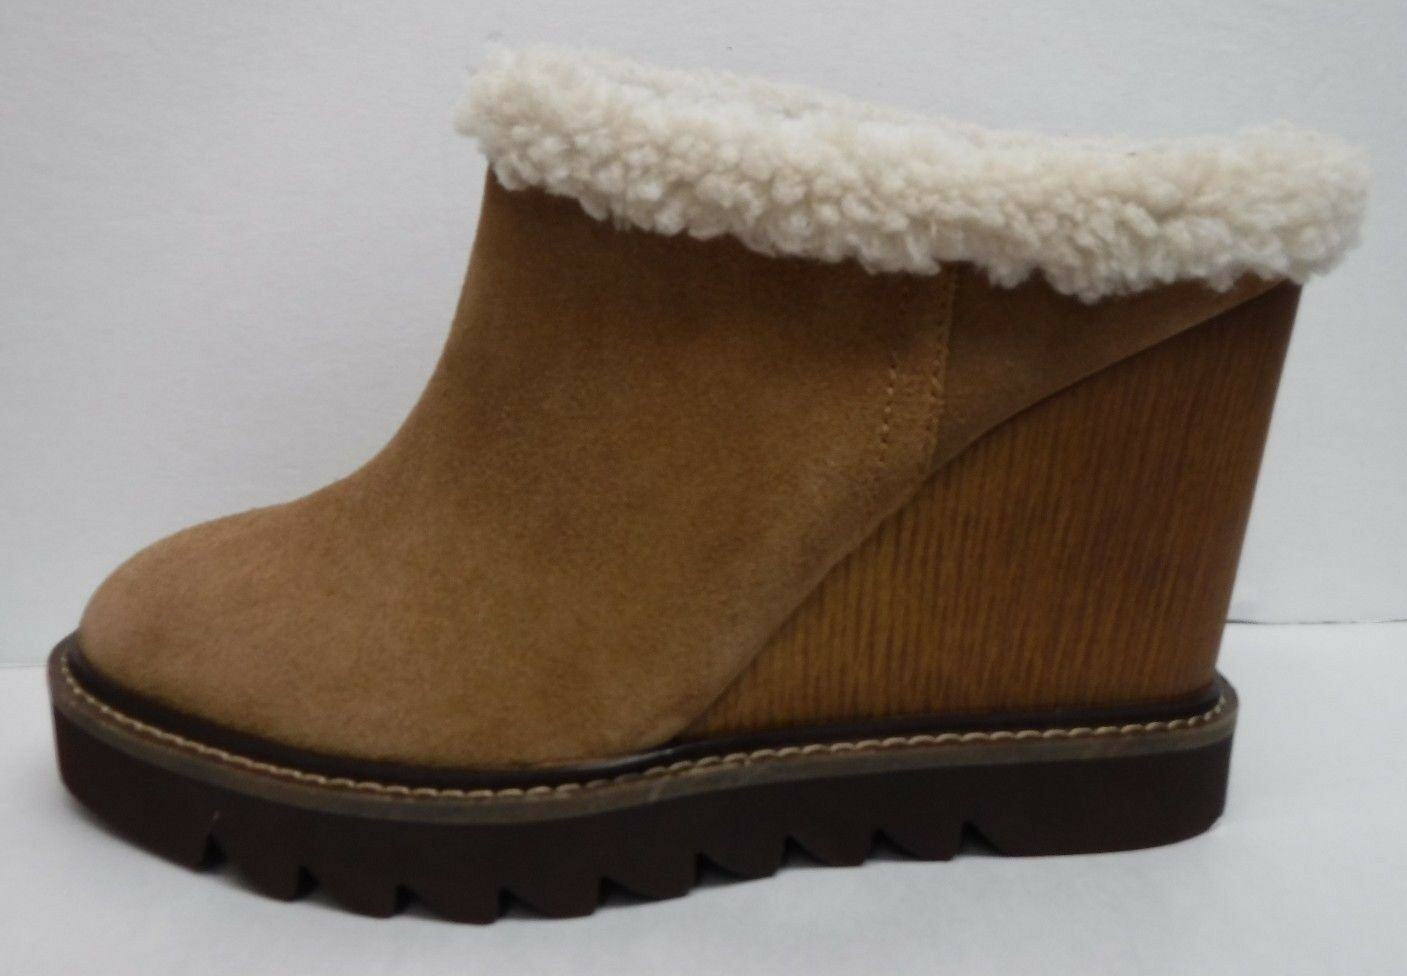 BCBG BCBGeneration Größe 9 New Leder Ankle Wedge Stiefel New 9 Damenschuhe Schuhes 0d4042